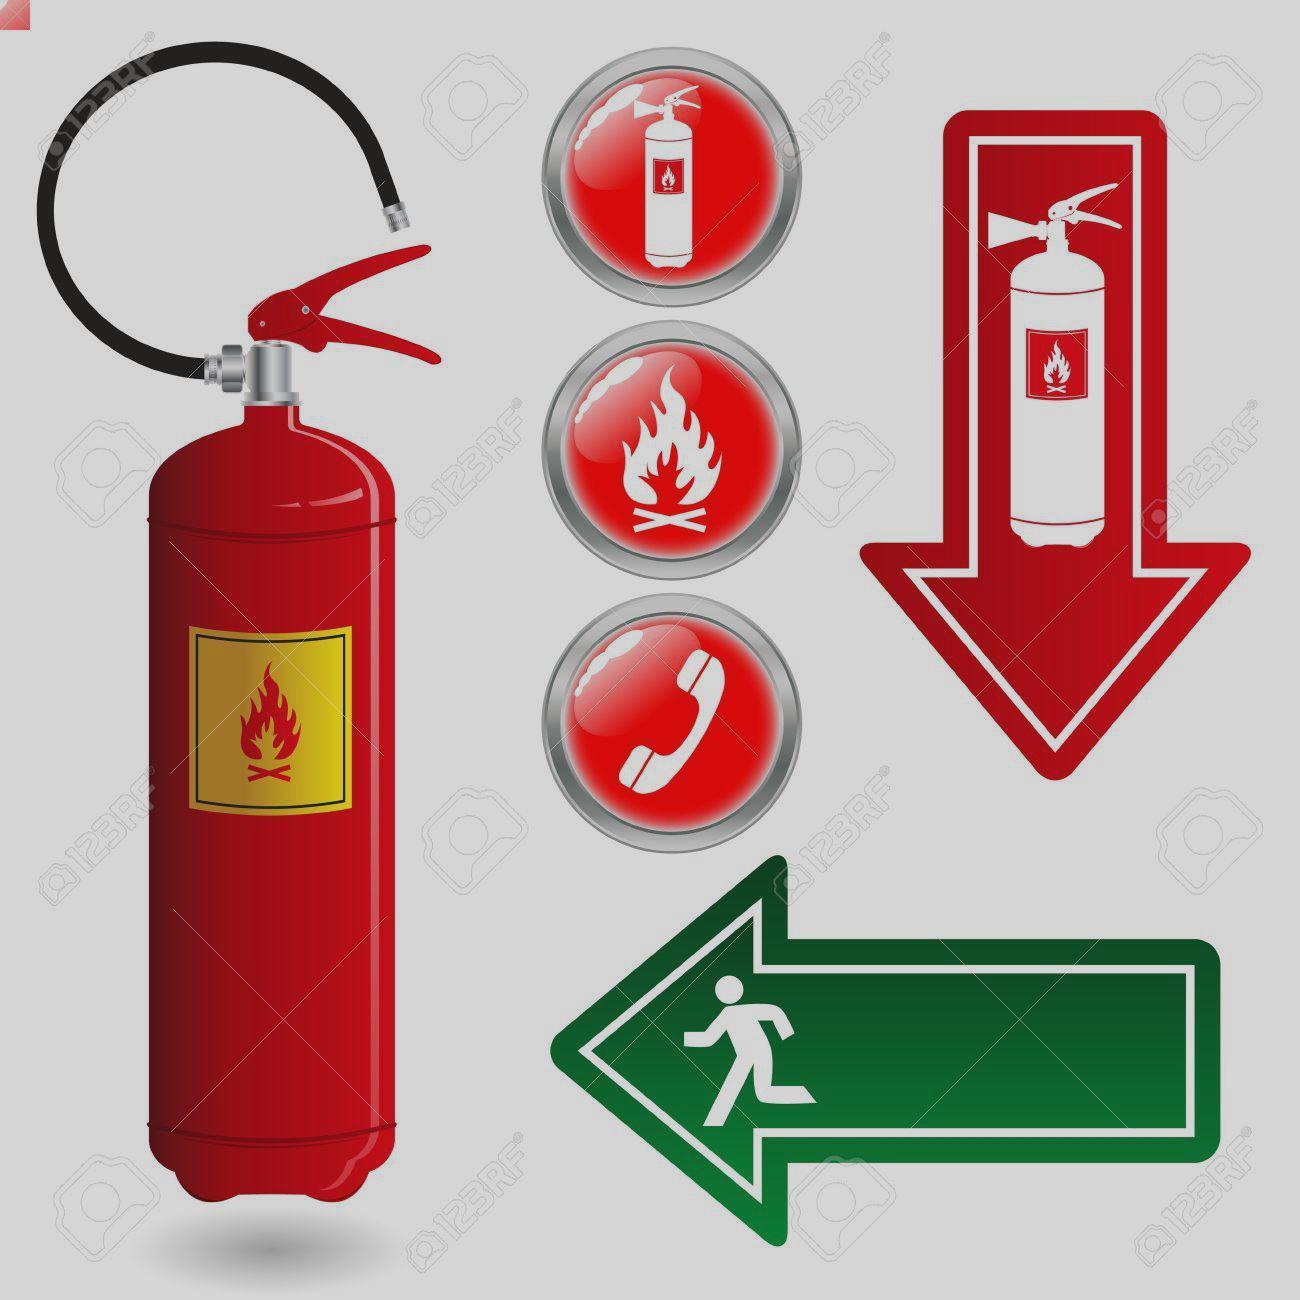 1300x1300 Clip Art 5 683 Fire Extinguisher Symbol Stock Illustrations